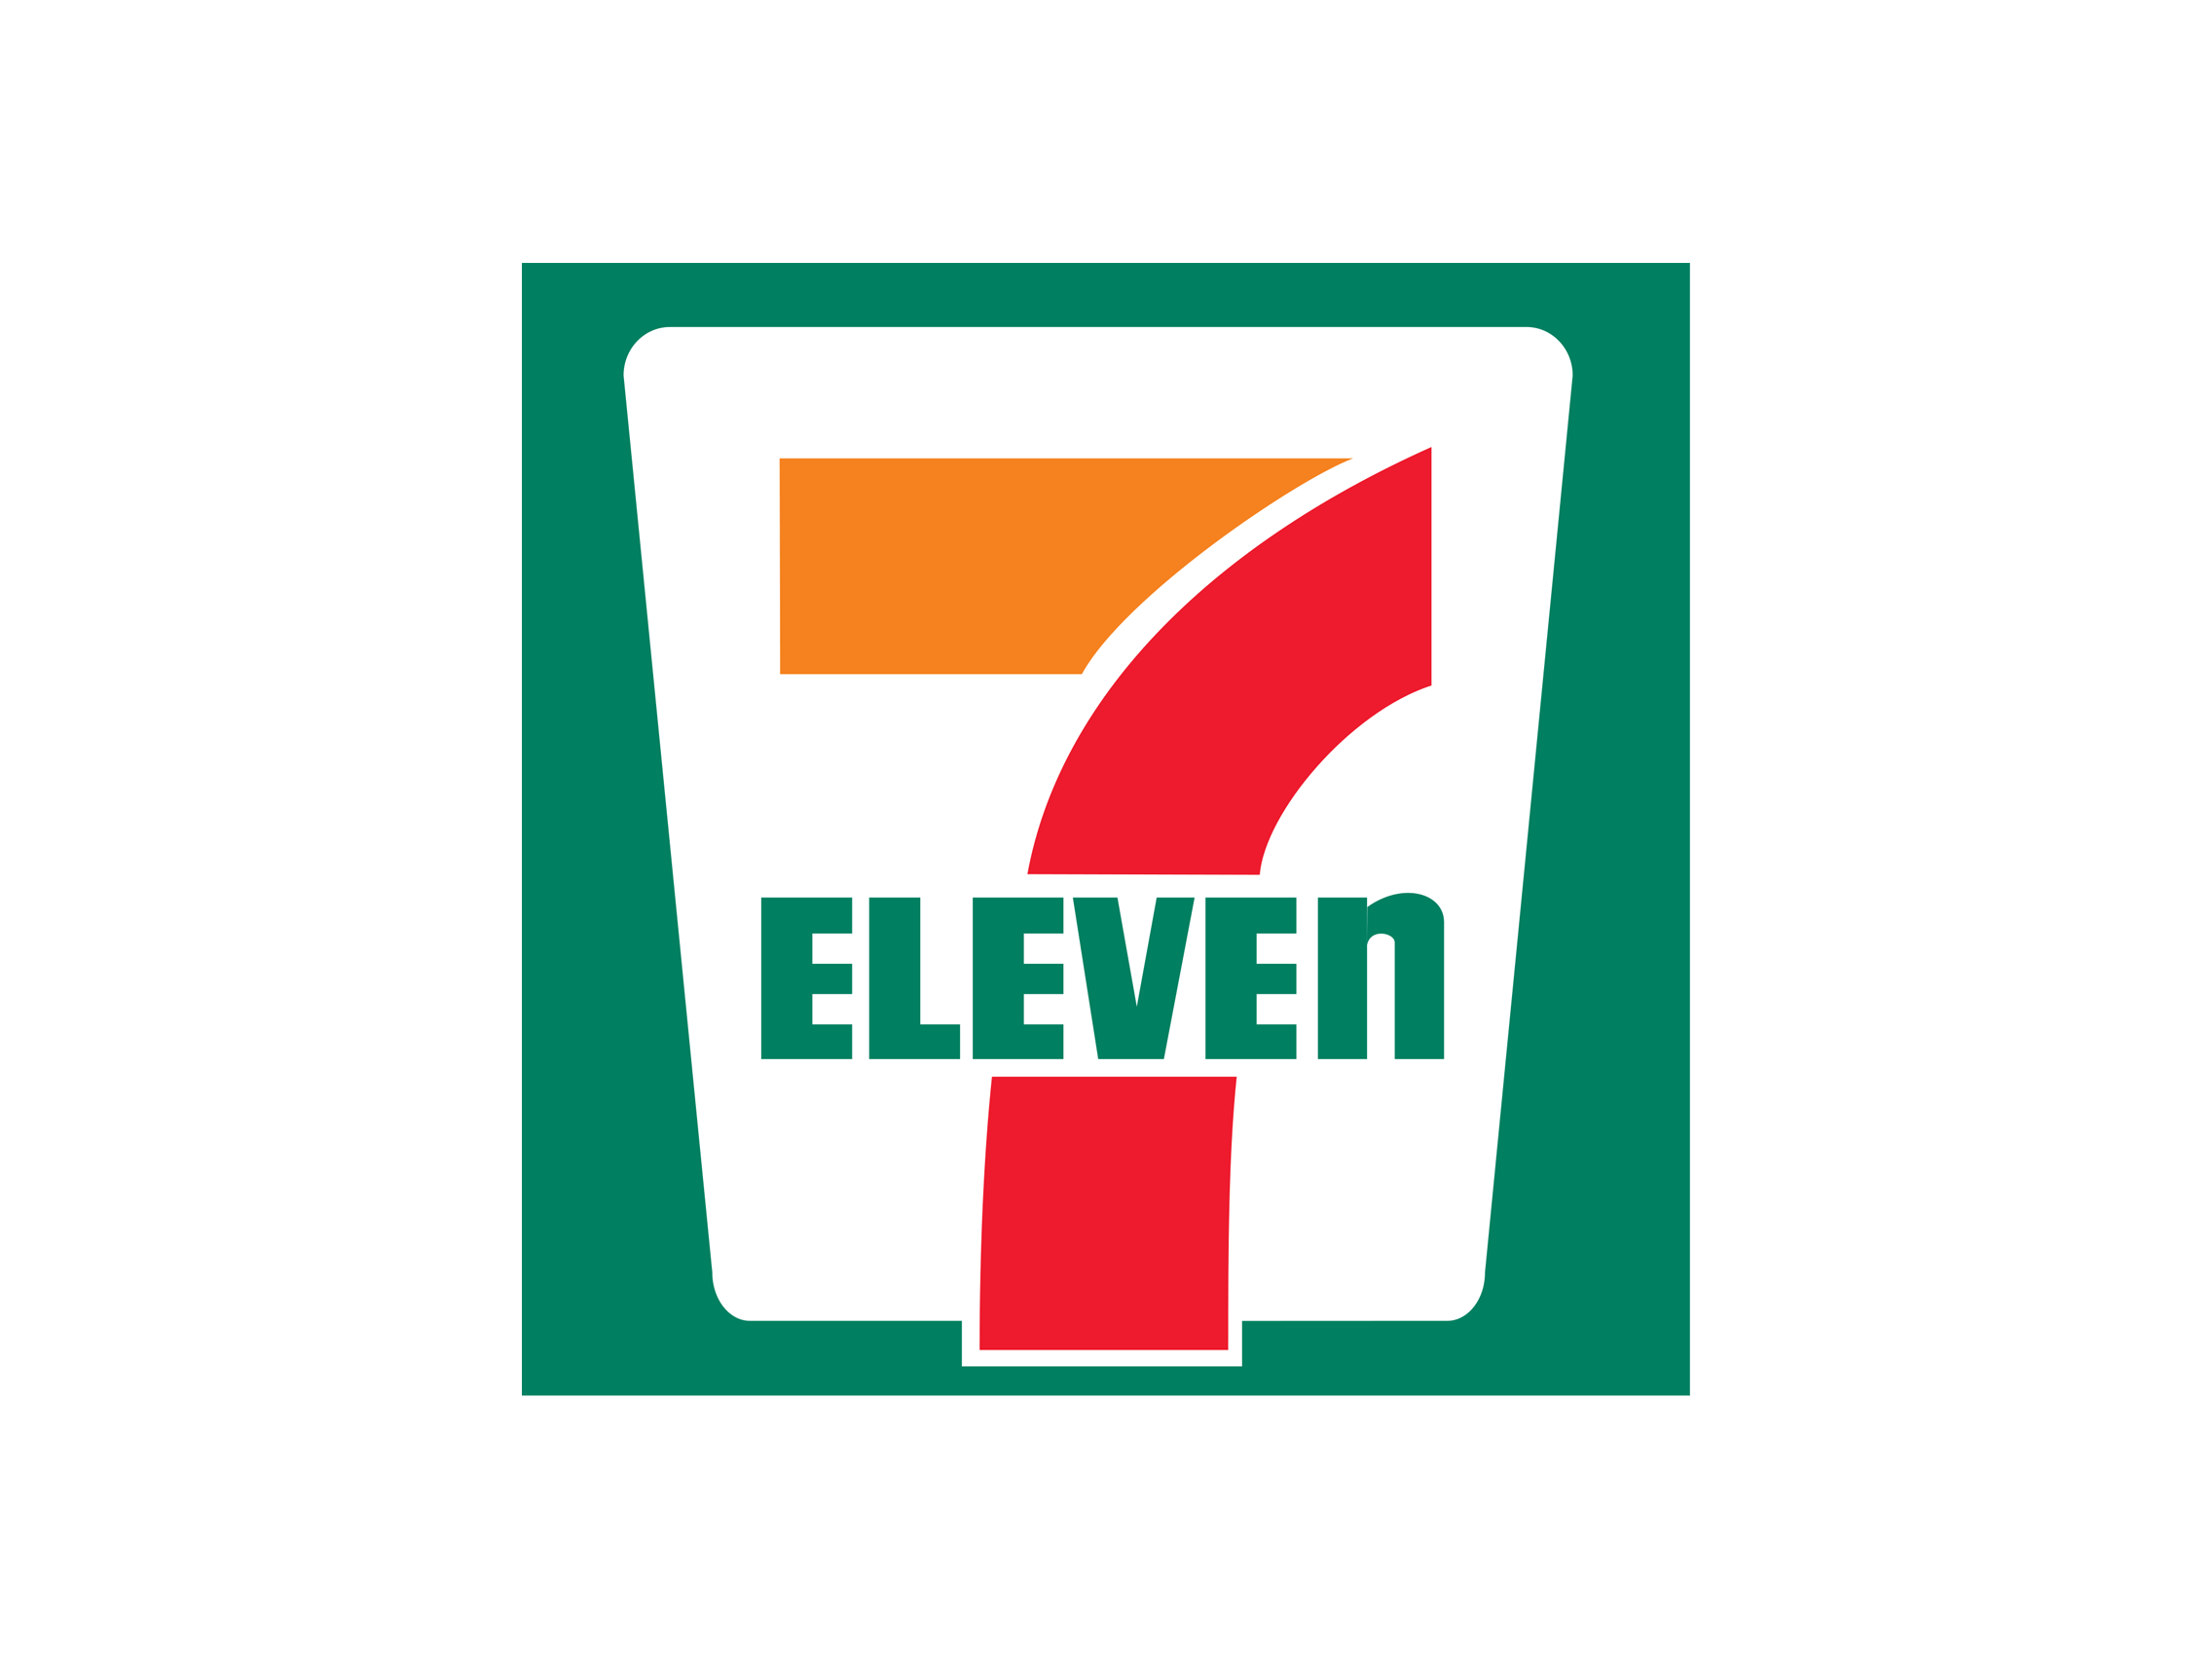 7-eleven logotyp